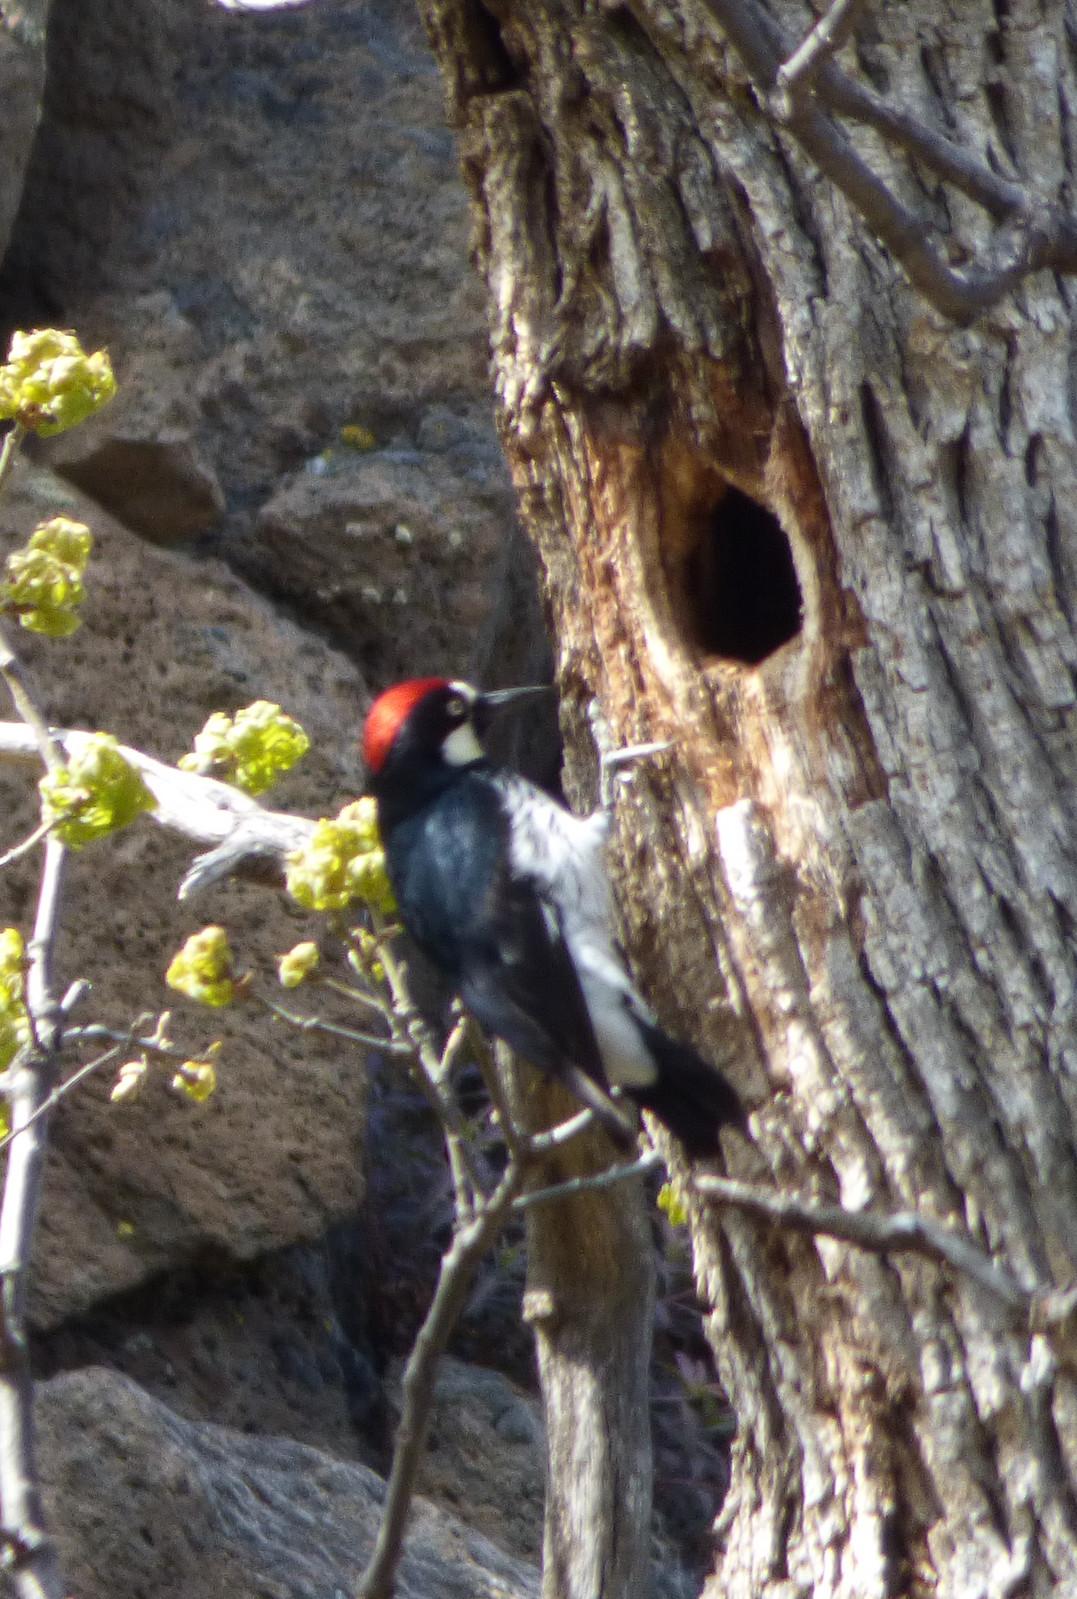 Acorn Woodpecker house shopping